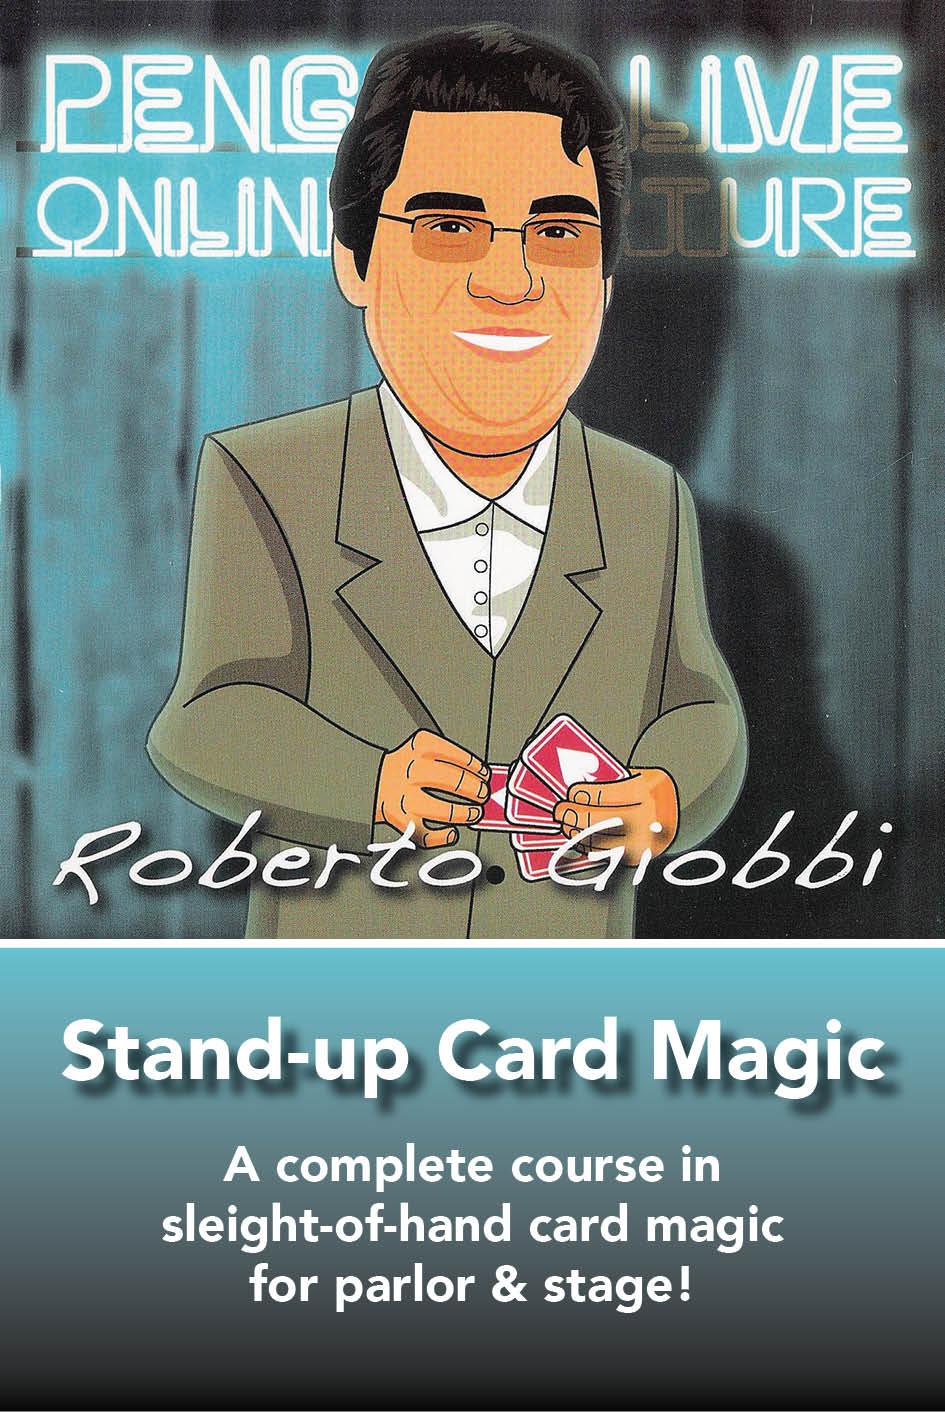 Roberto giobbi college pdf card